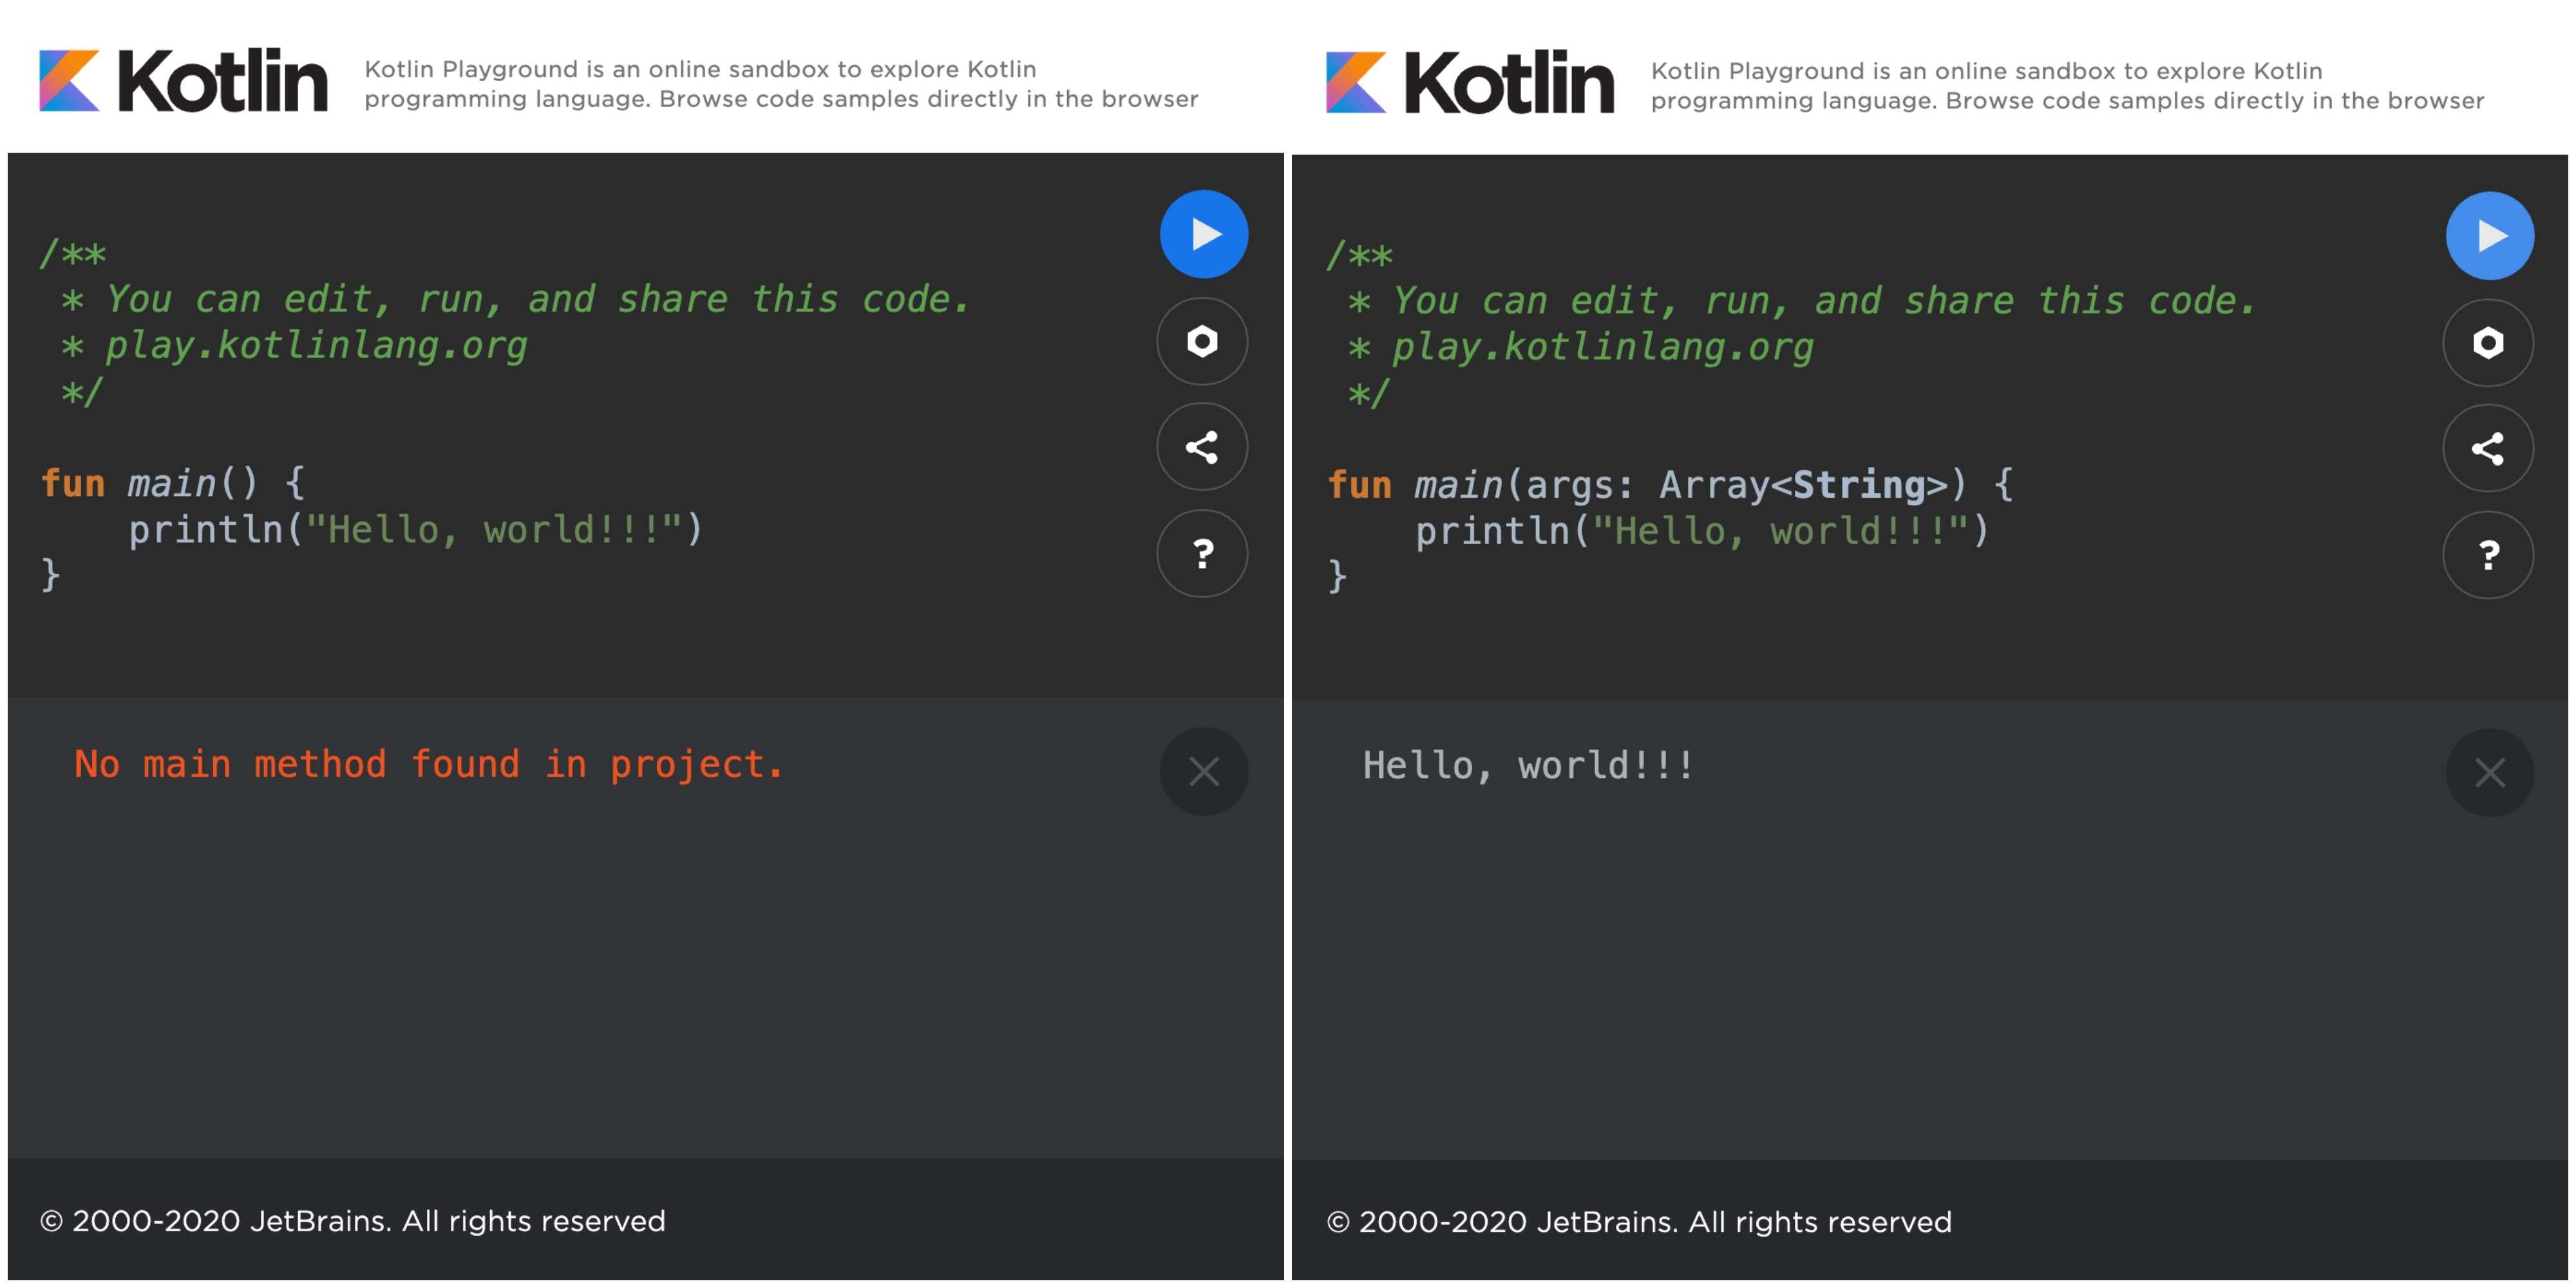 Kotlin 1.2 vs Kotlin 1.3 Run Hello World